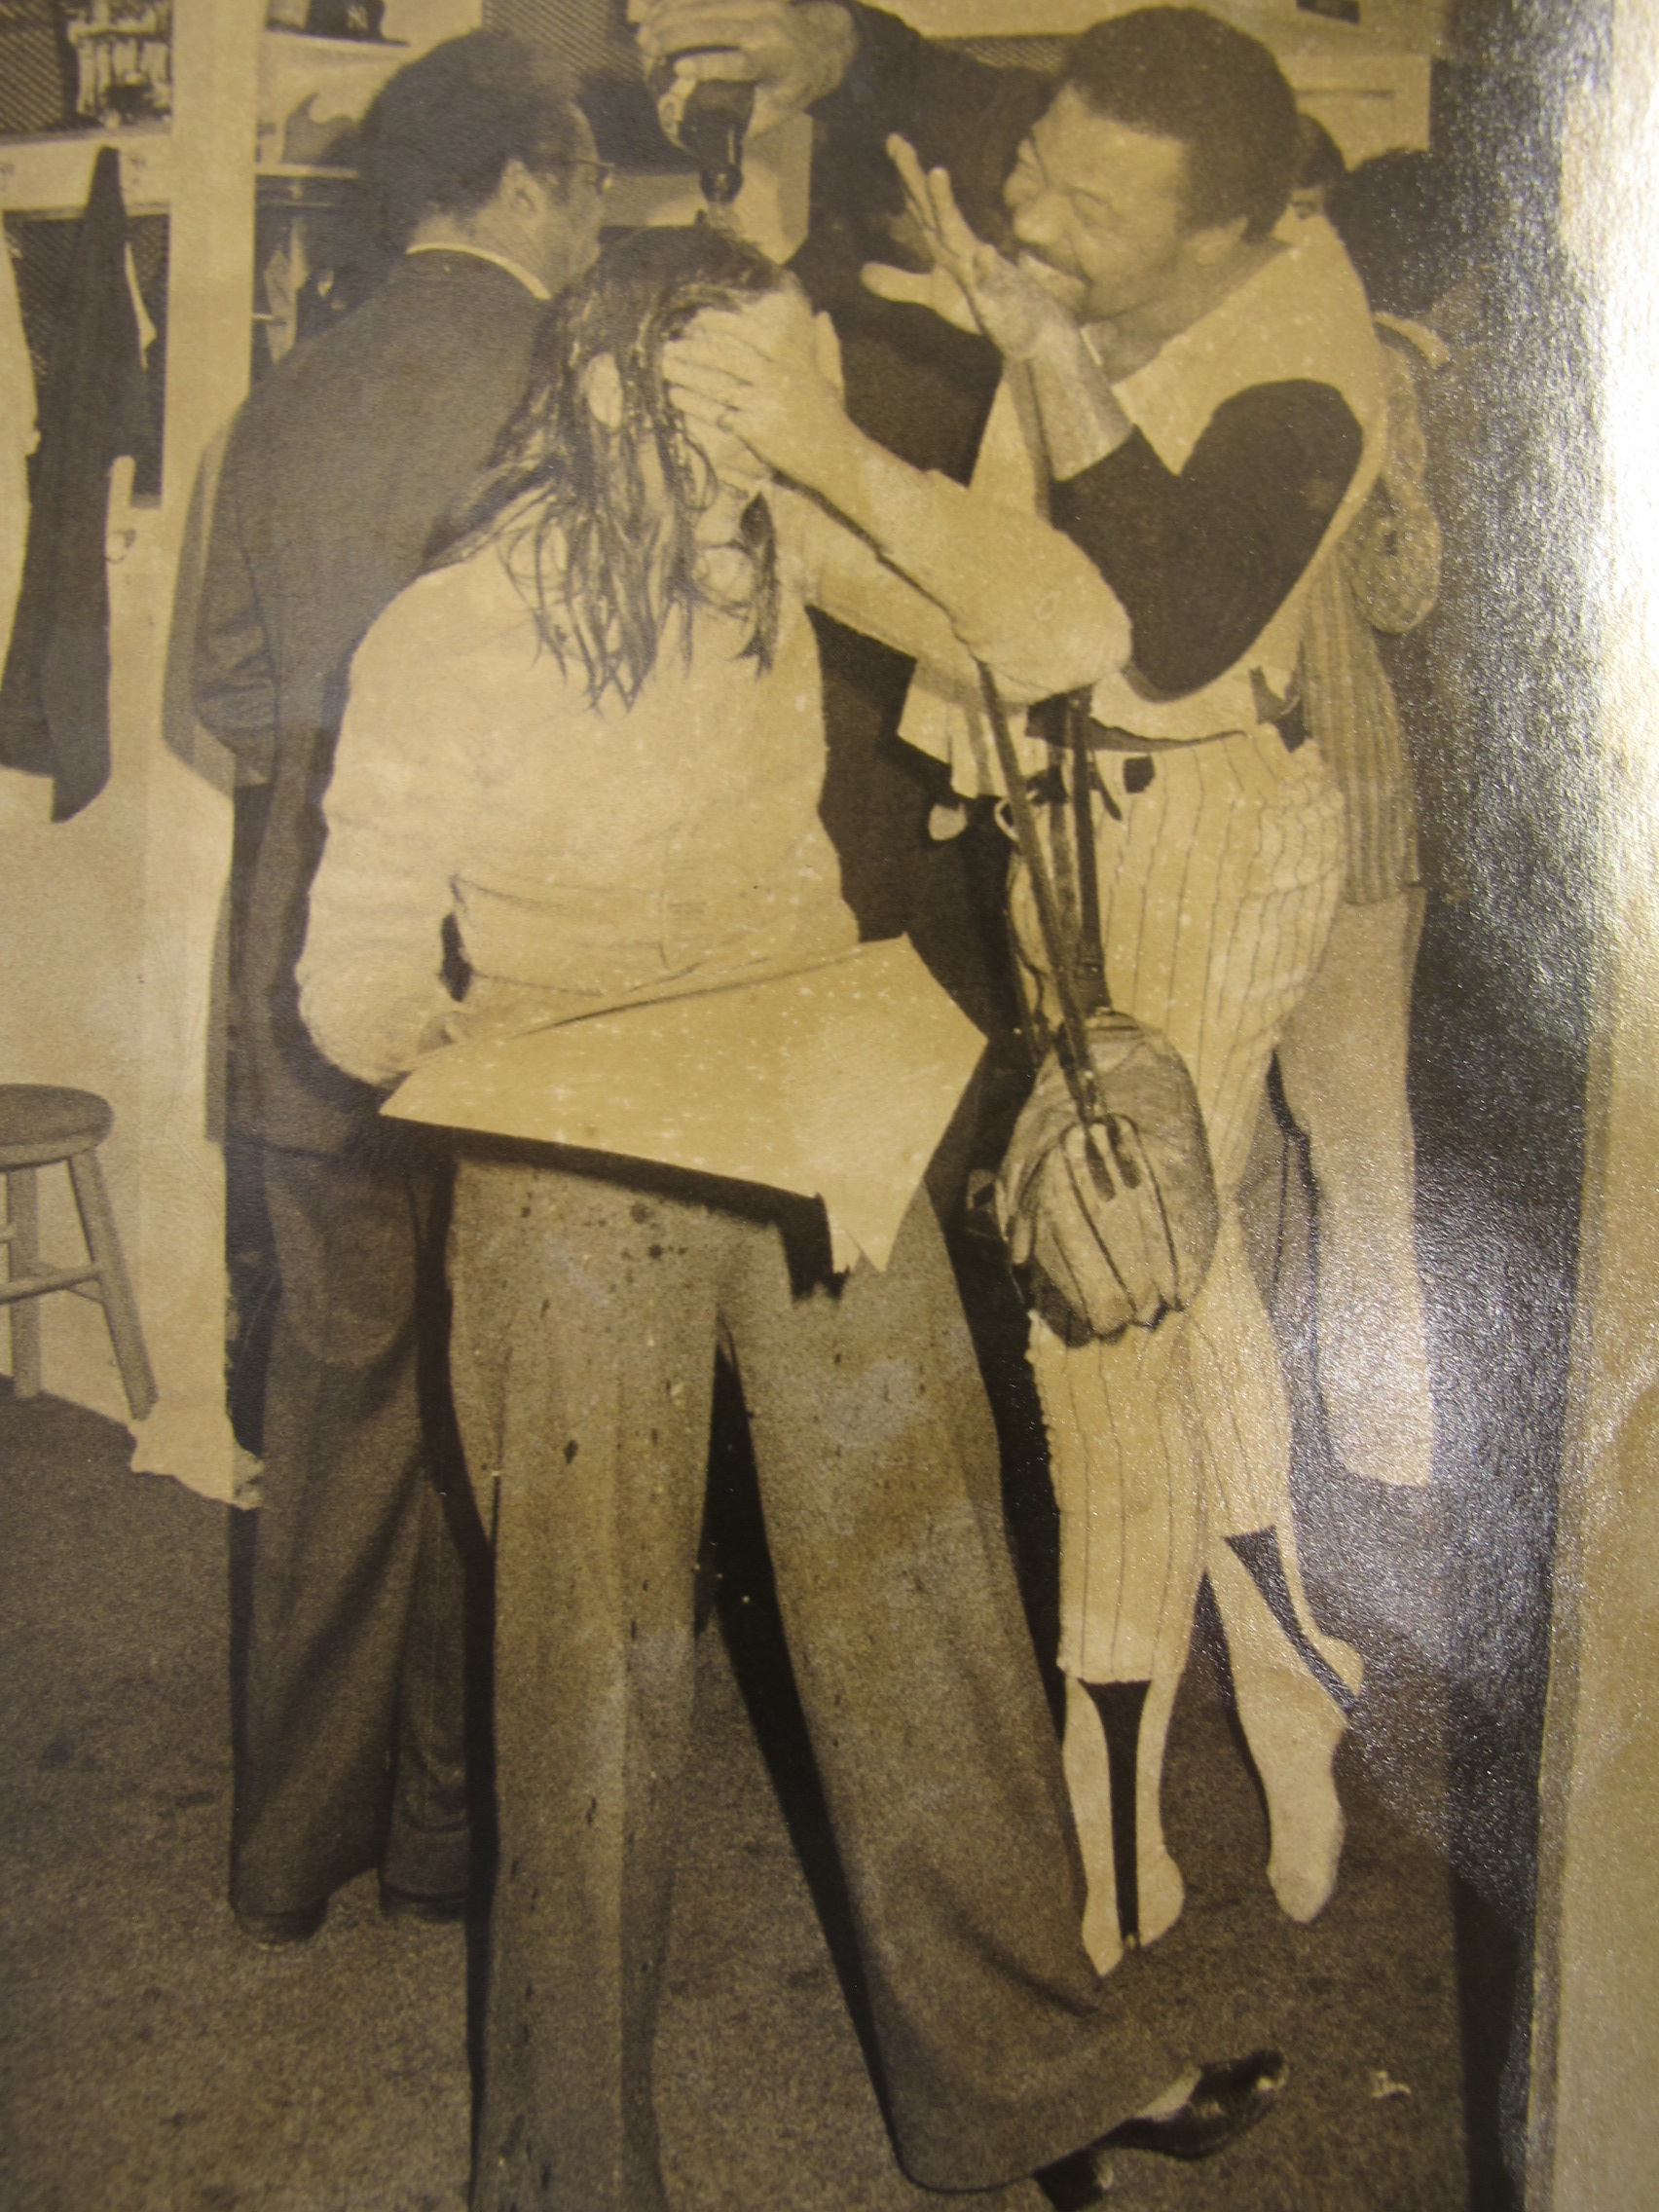 Cliff Johnson pours Champagne over Melissa Ludtke's head in the New York Yankees locker room, 1978